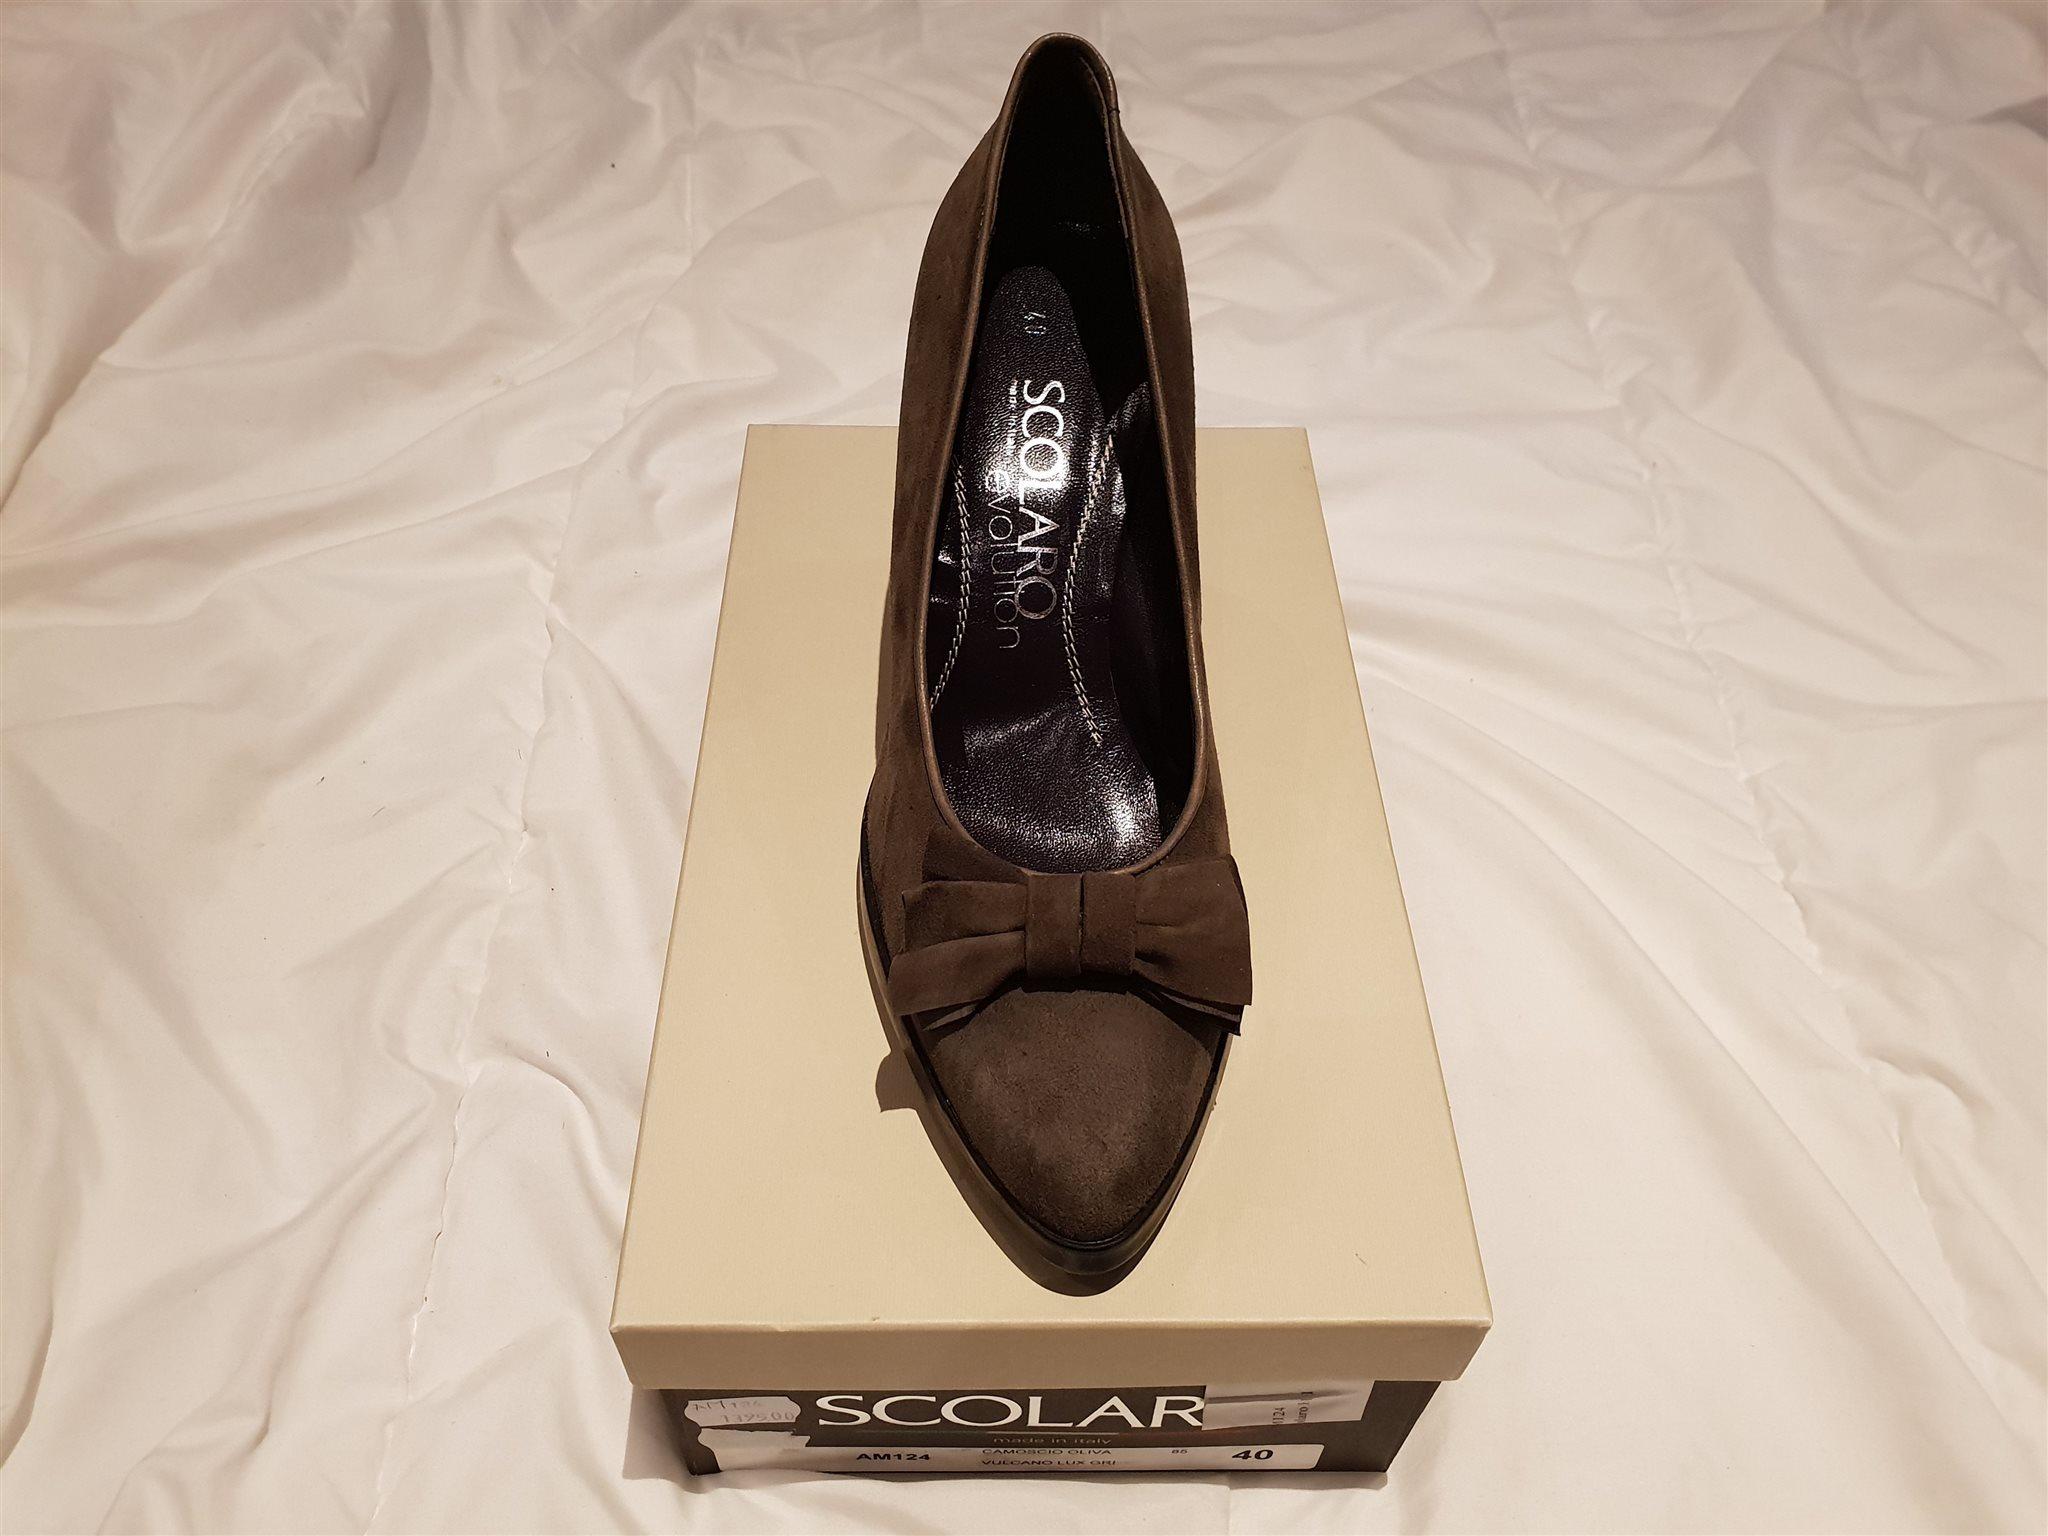 Nya snygga högklackade skor från Scolaro 2e65e99391ab5